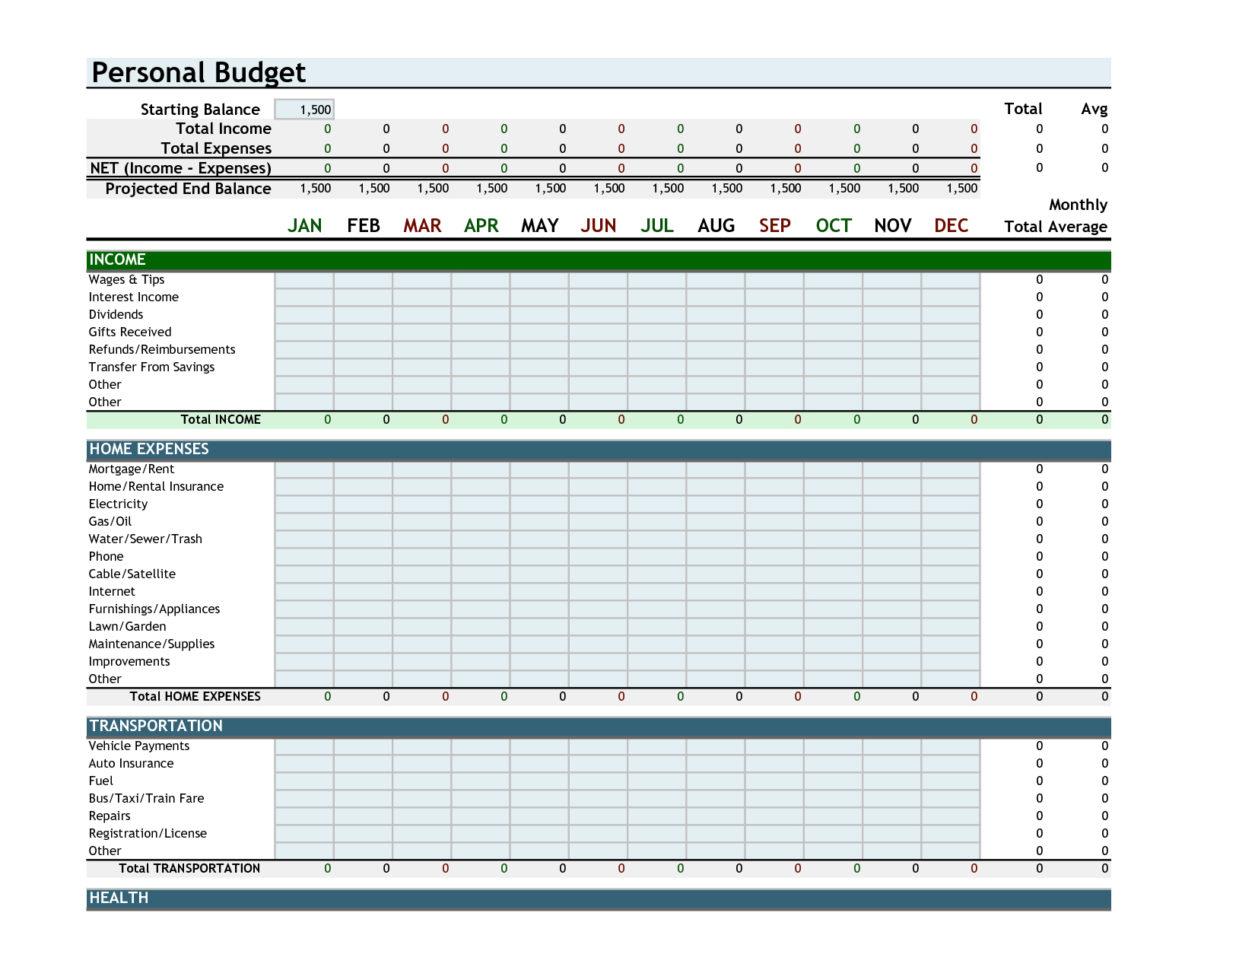 Budget Spreadsheet Reddit Pertaining To Budget Spreadsheet Excel Reddit Free Australia Calculator Uk